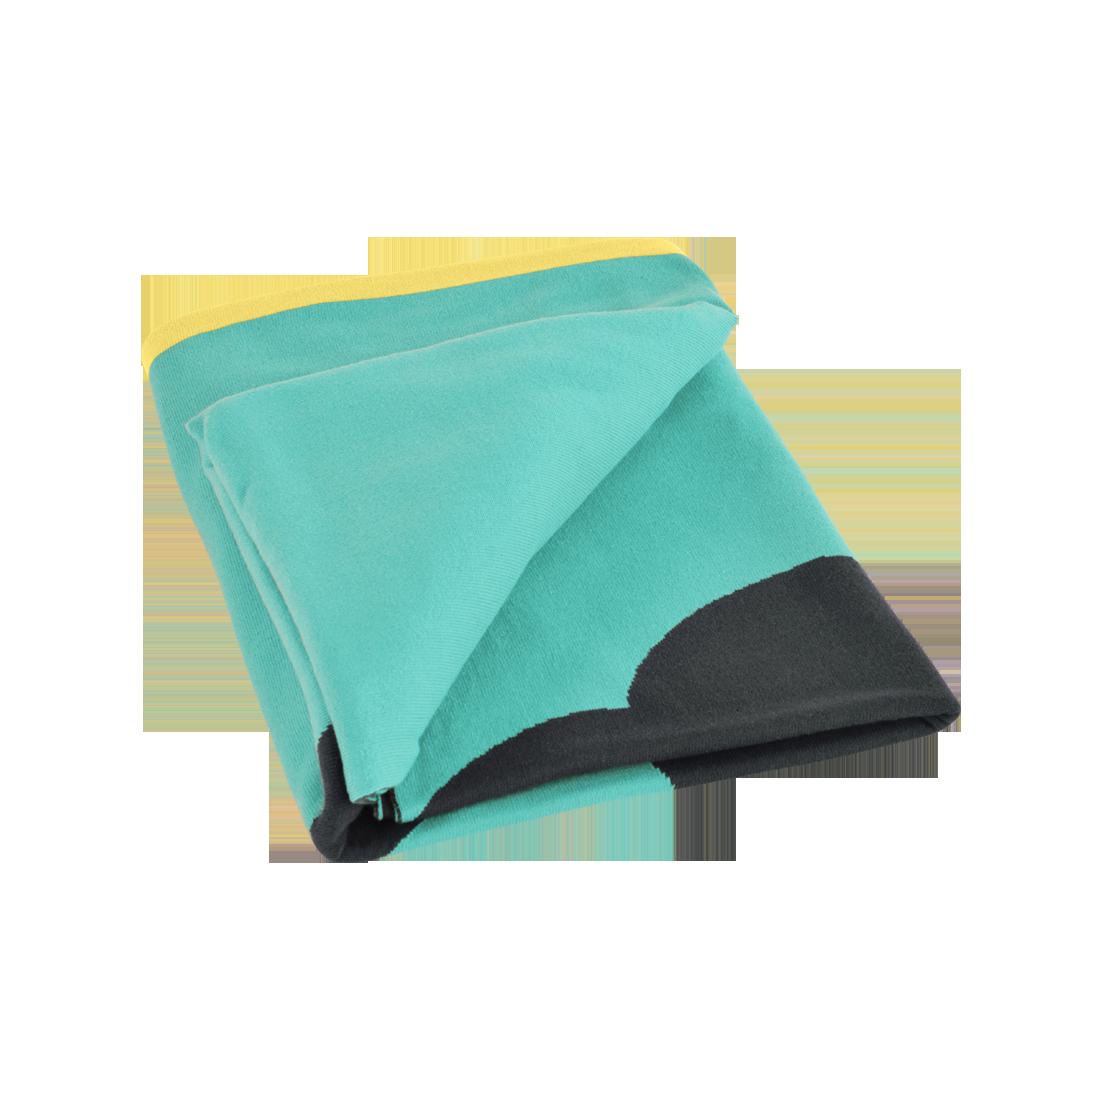 Tr fle blanket outdoor plaid fermob - Plaid bleu turquoise ...